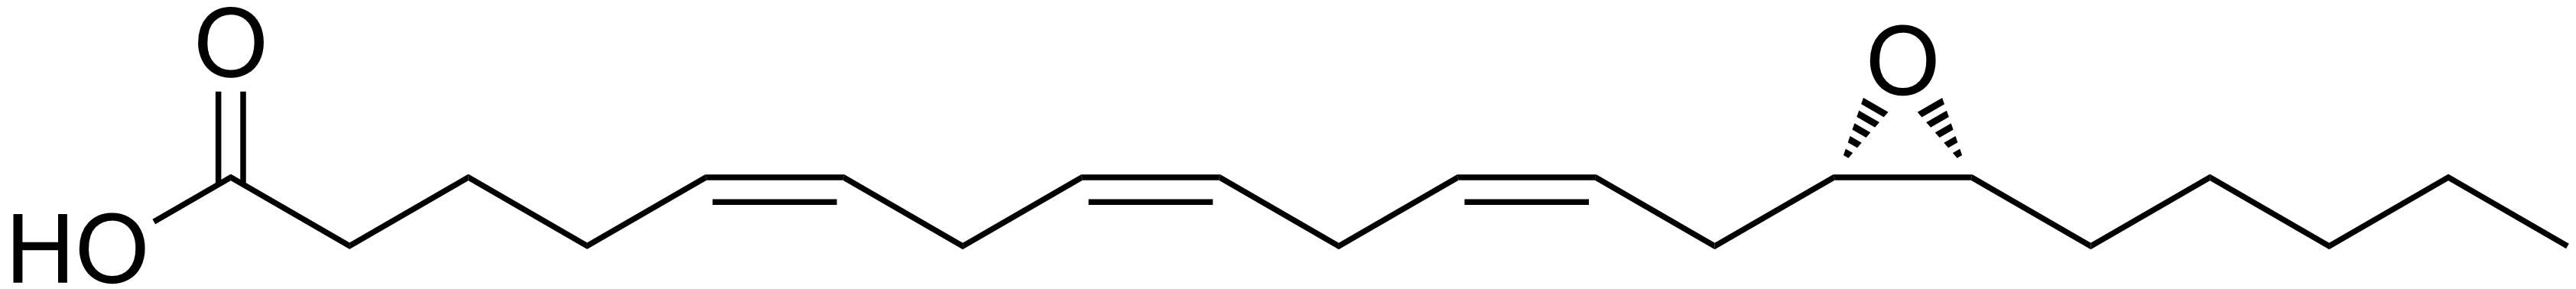 Archivo:Epoxyeicosatrienoic acid.png